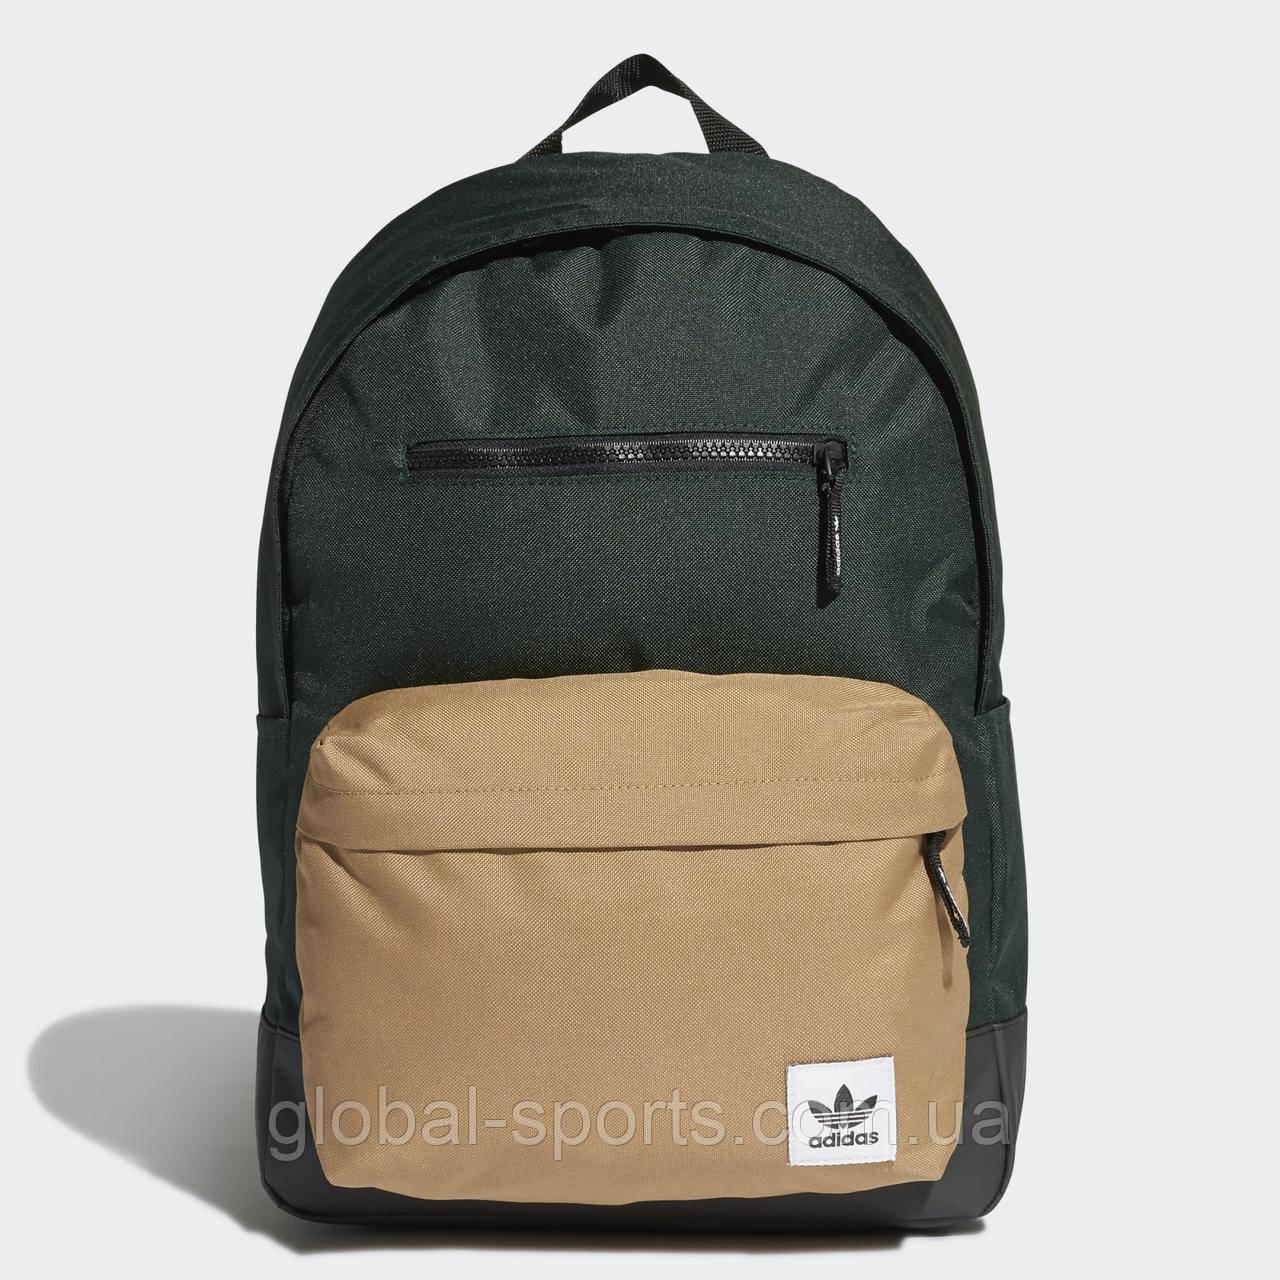 Рюкзак Adidas Premium Essentials BP (Артикул: FM1277)